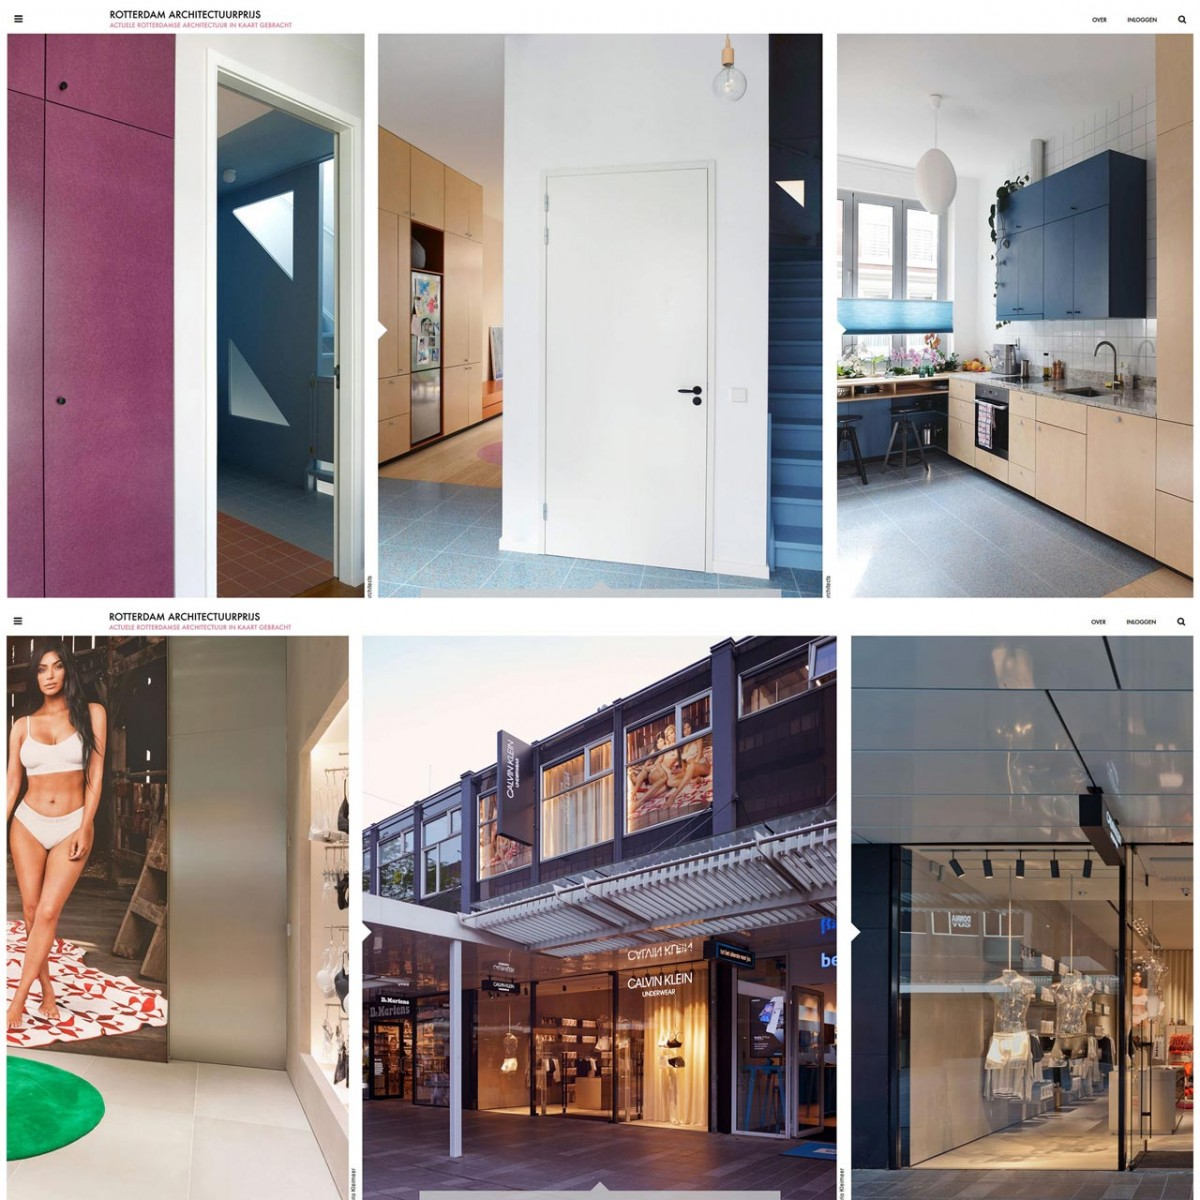 Calvin Klein Lijnbaan and Work Home – Play Home up for Rotterdam Architectuurprijs 2018